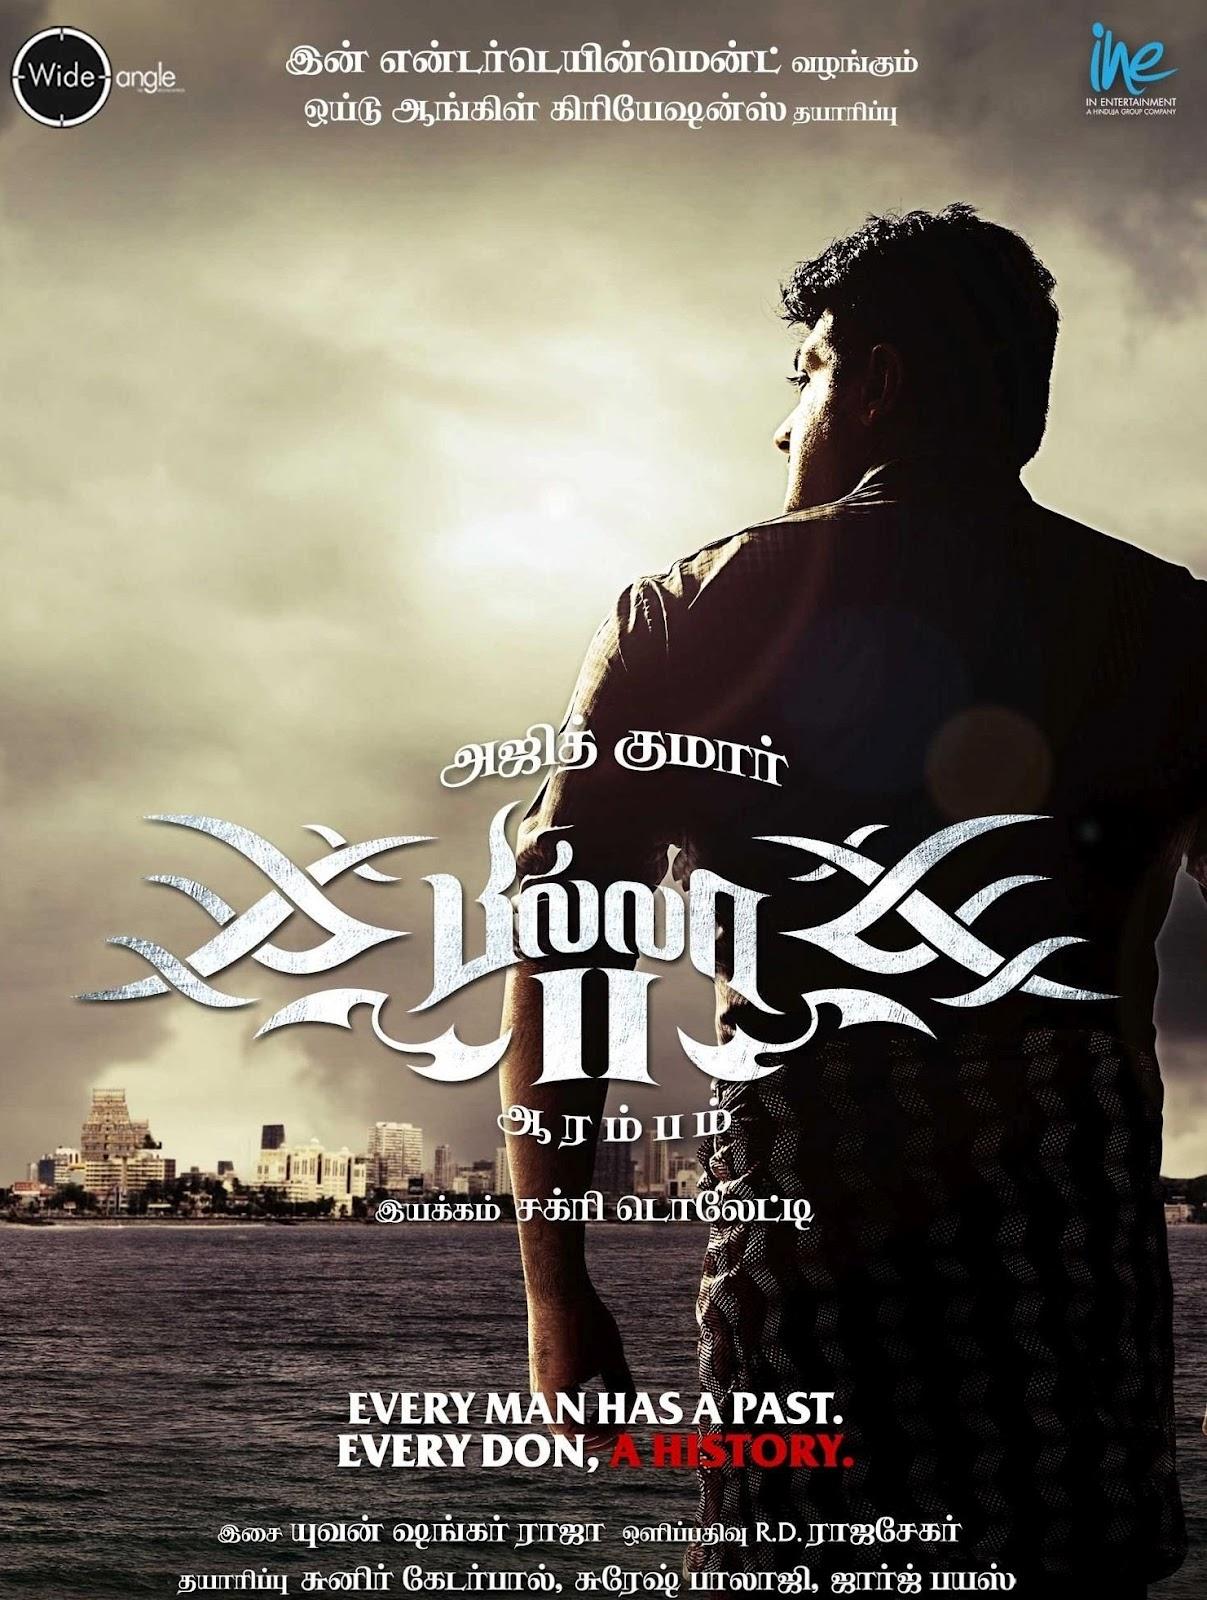 Tamil billa background music free download - iteco-m ru